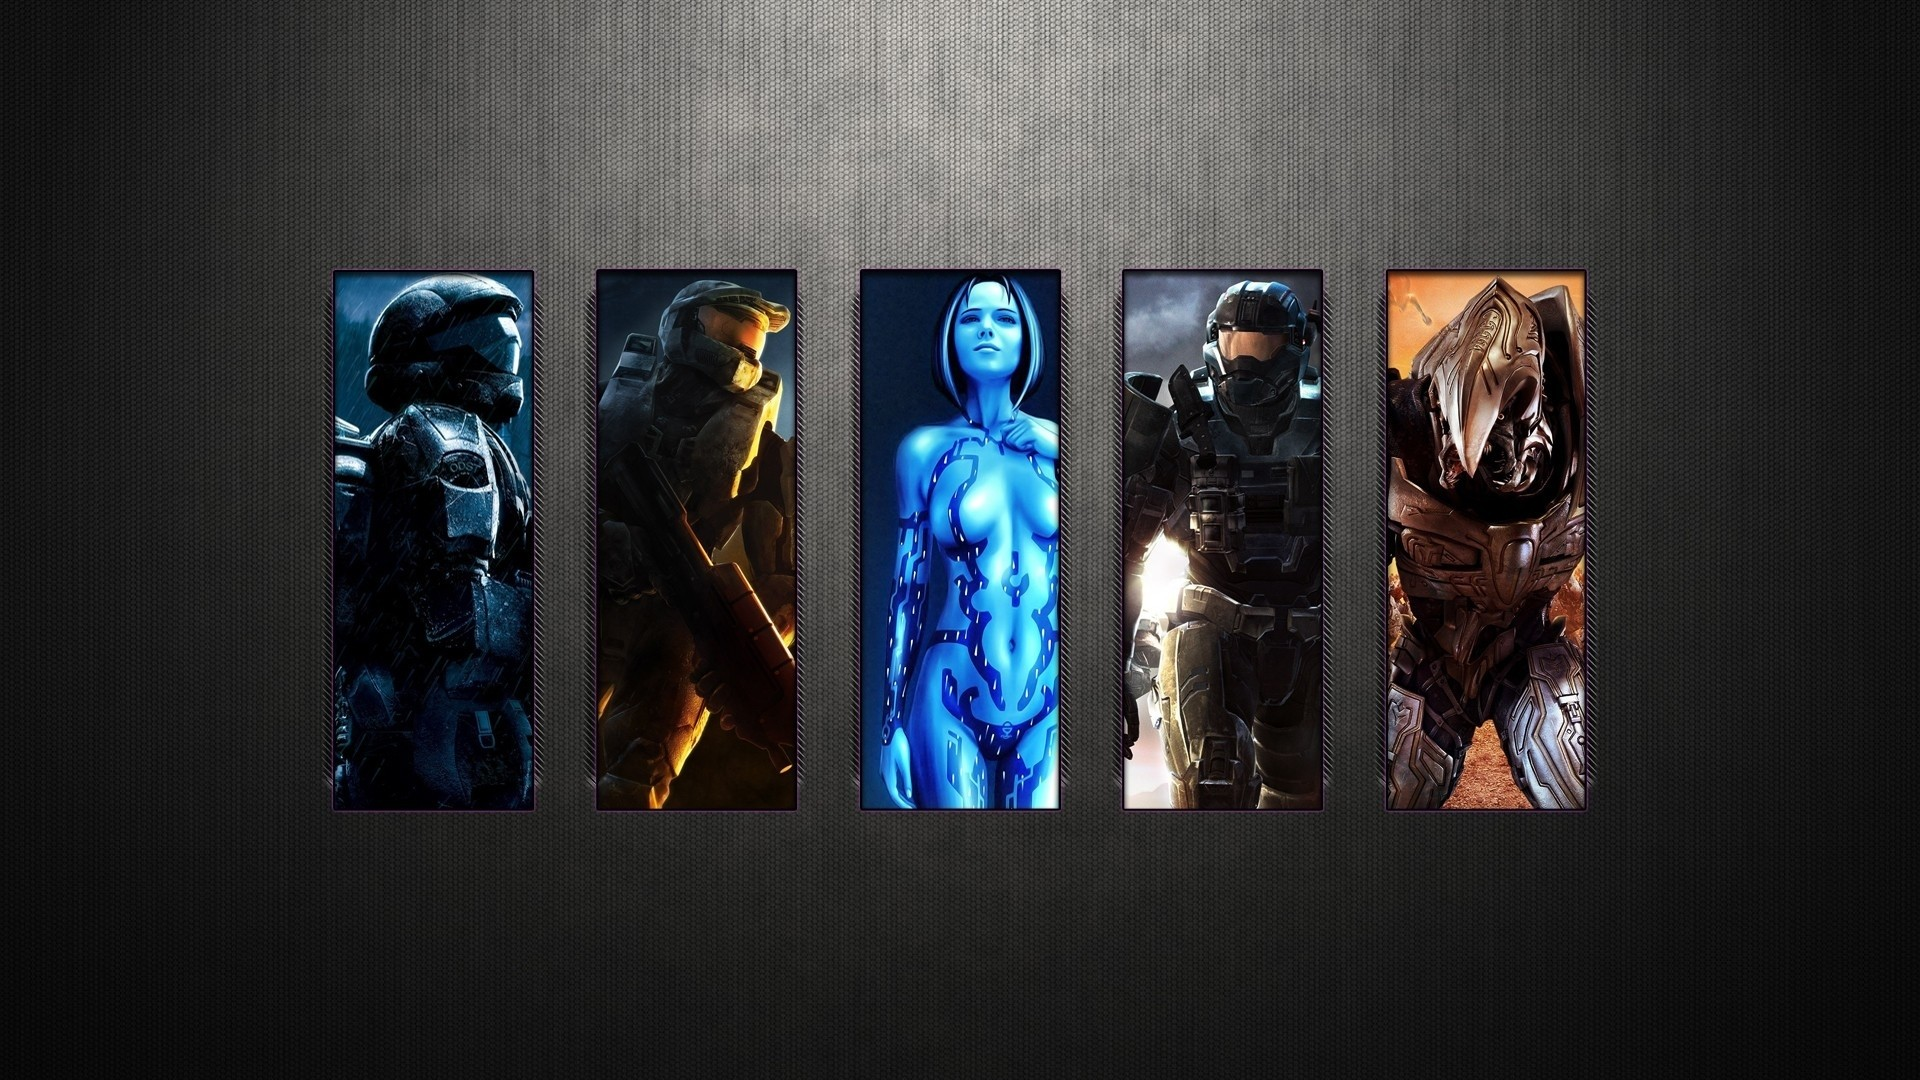 Video games cortana halo master chief halo odst halo reach collage arbiter  wallpaper